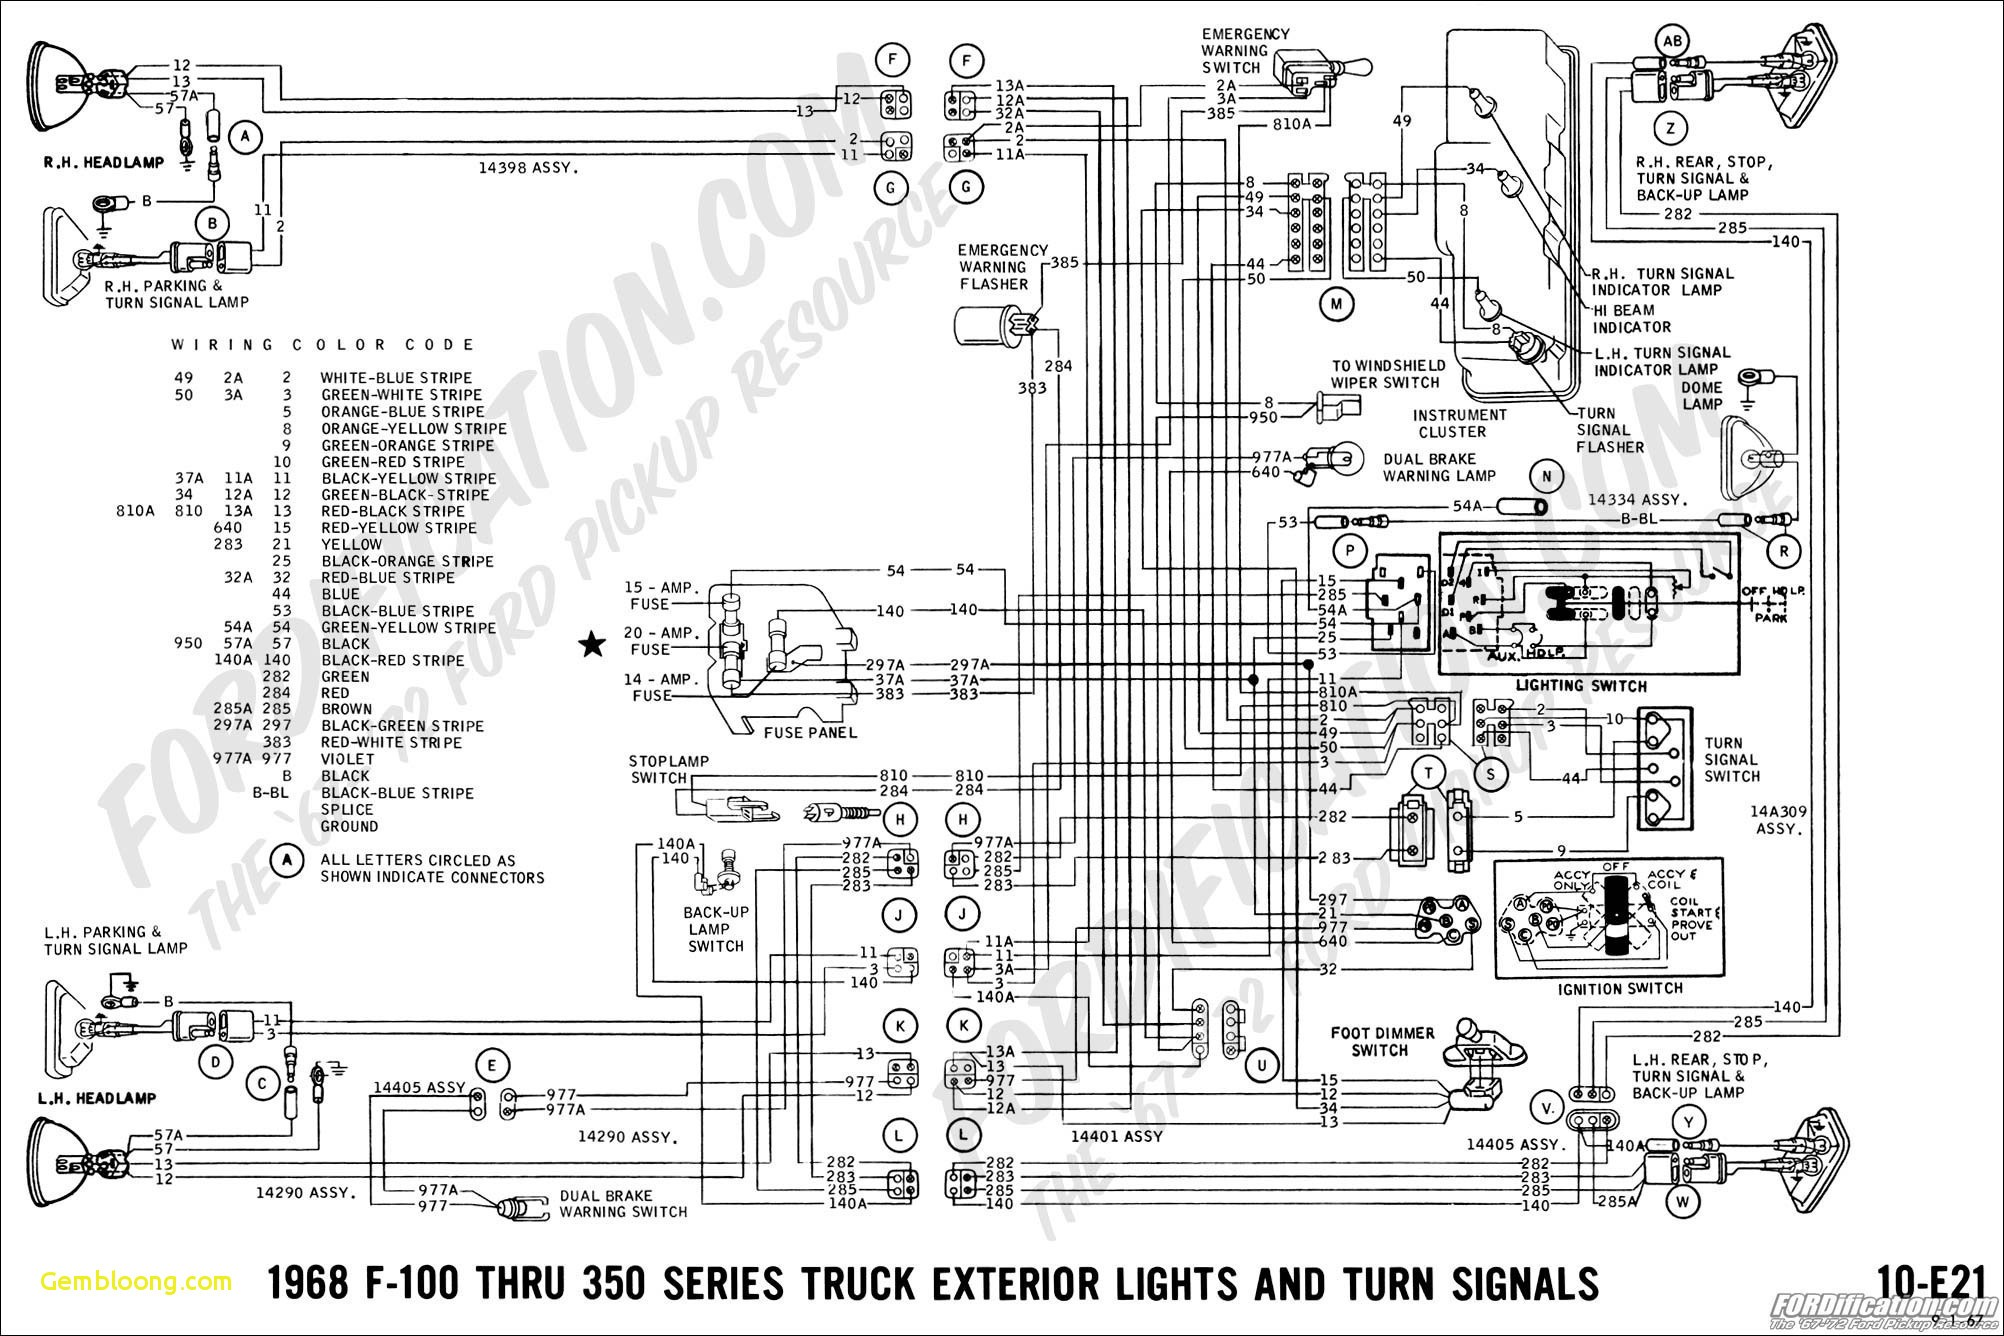 Ford 4 2 Engine Diagram 10 ford Trucks Wiring Diagrams Free – Wiring Diagram Of Ford 4 2 Engine Diagram